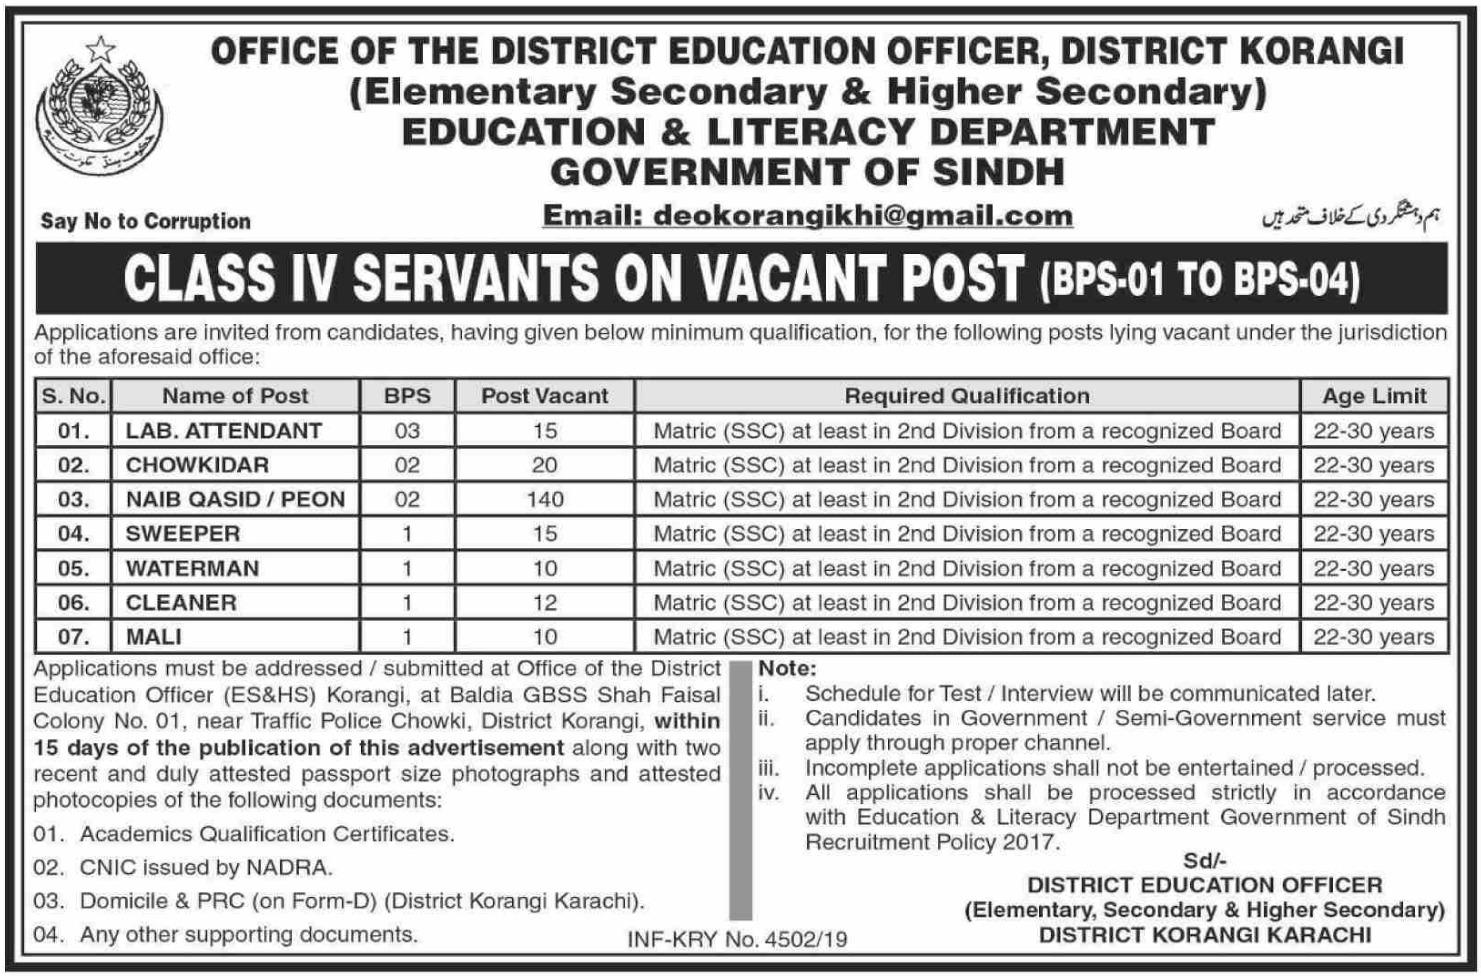 Photo of Education & Literacy Department Govt of Sindh Jobs 2019 Karachi job